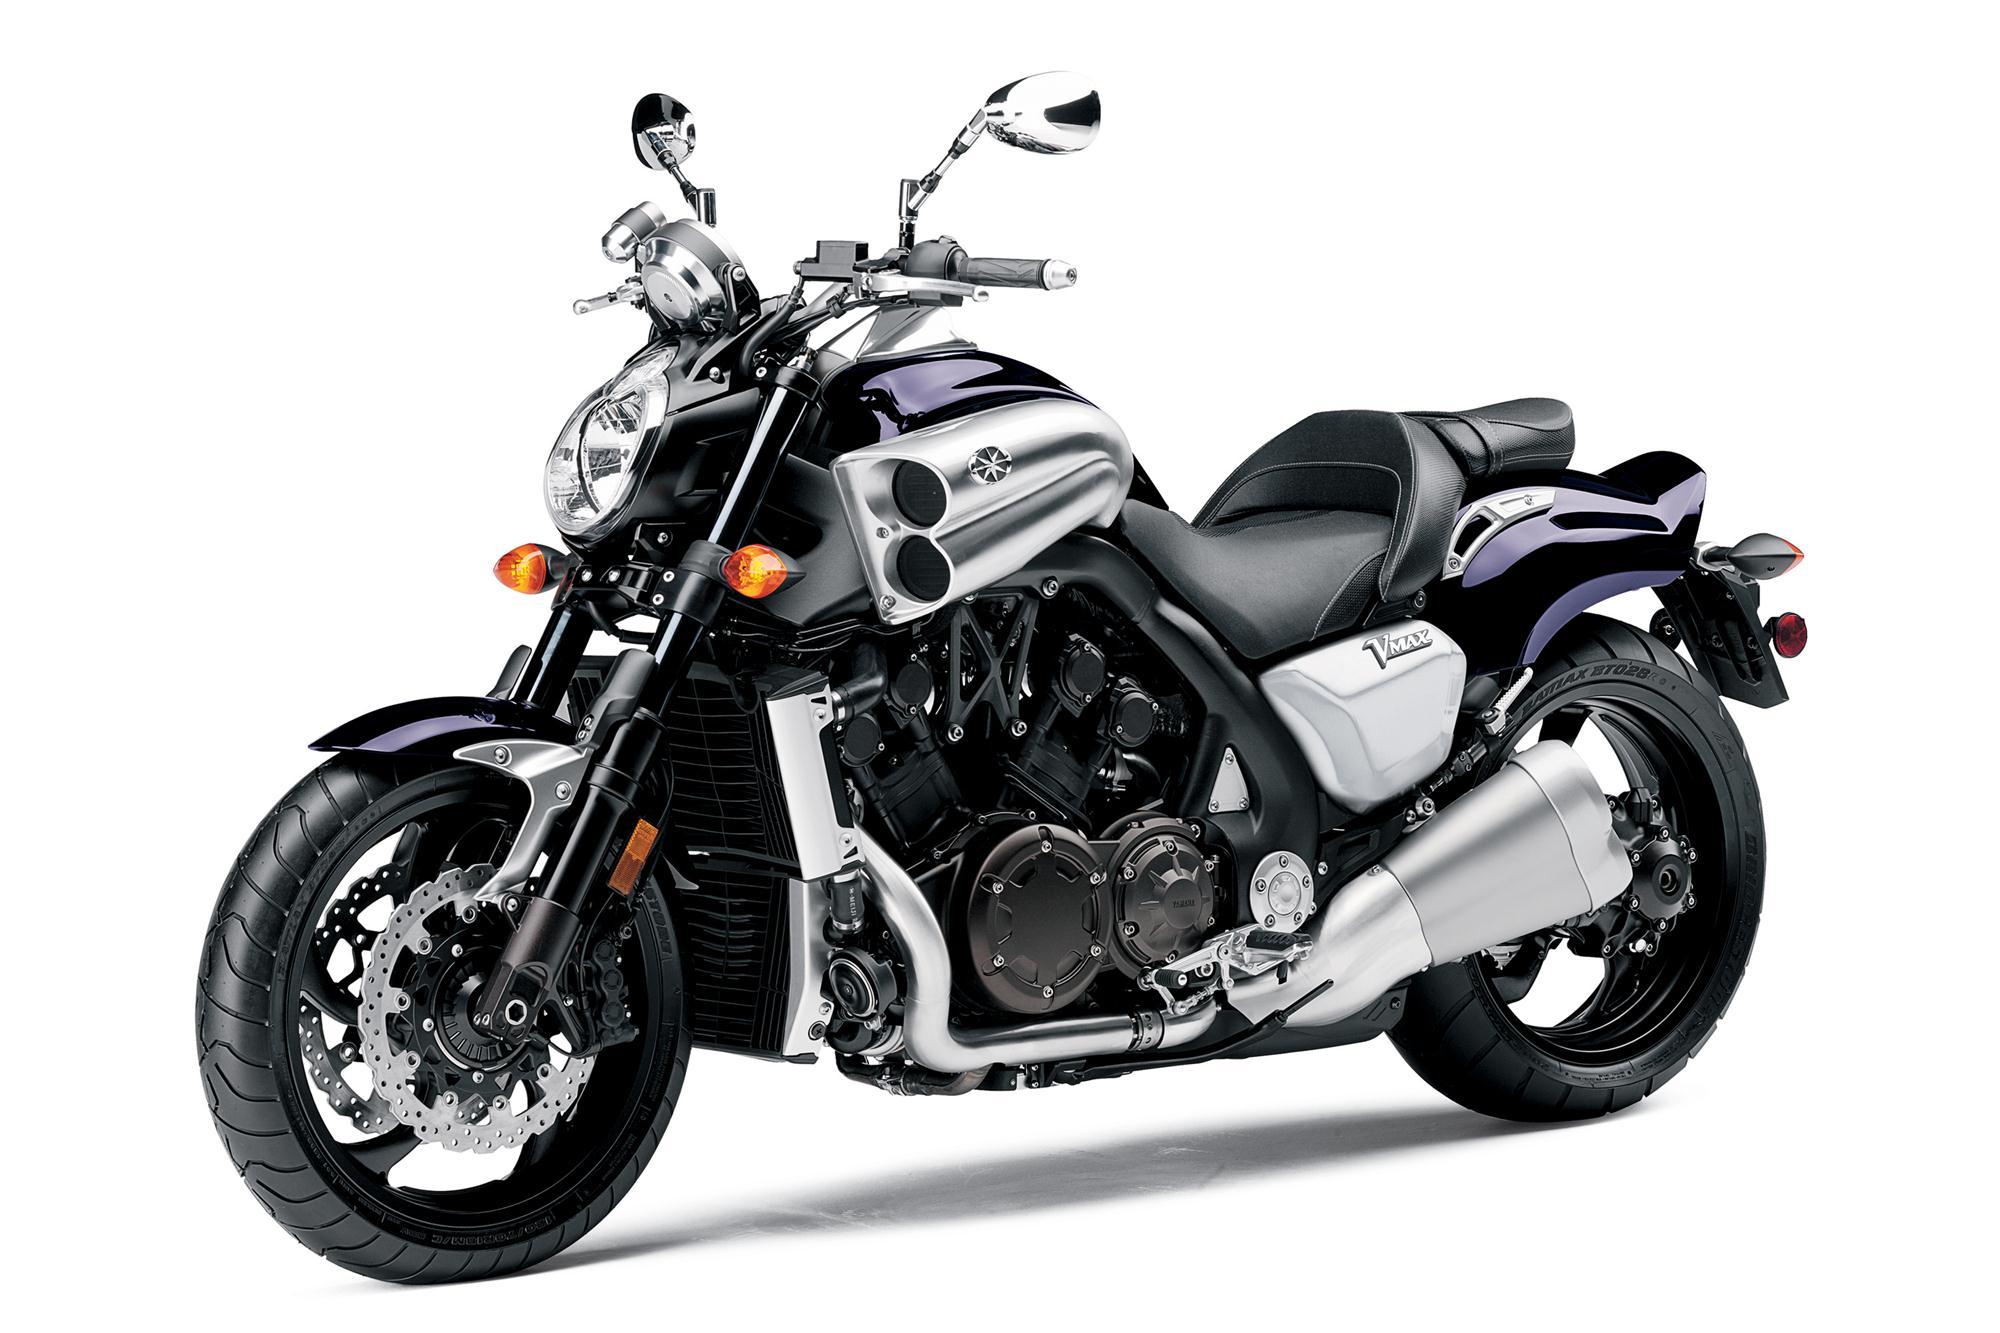 New Yamaha Vmax Price